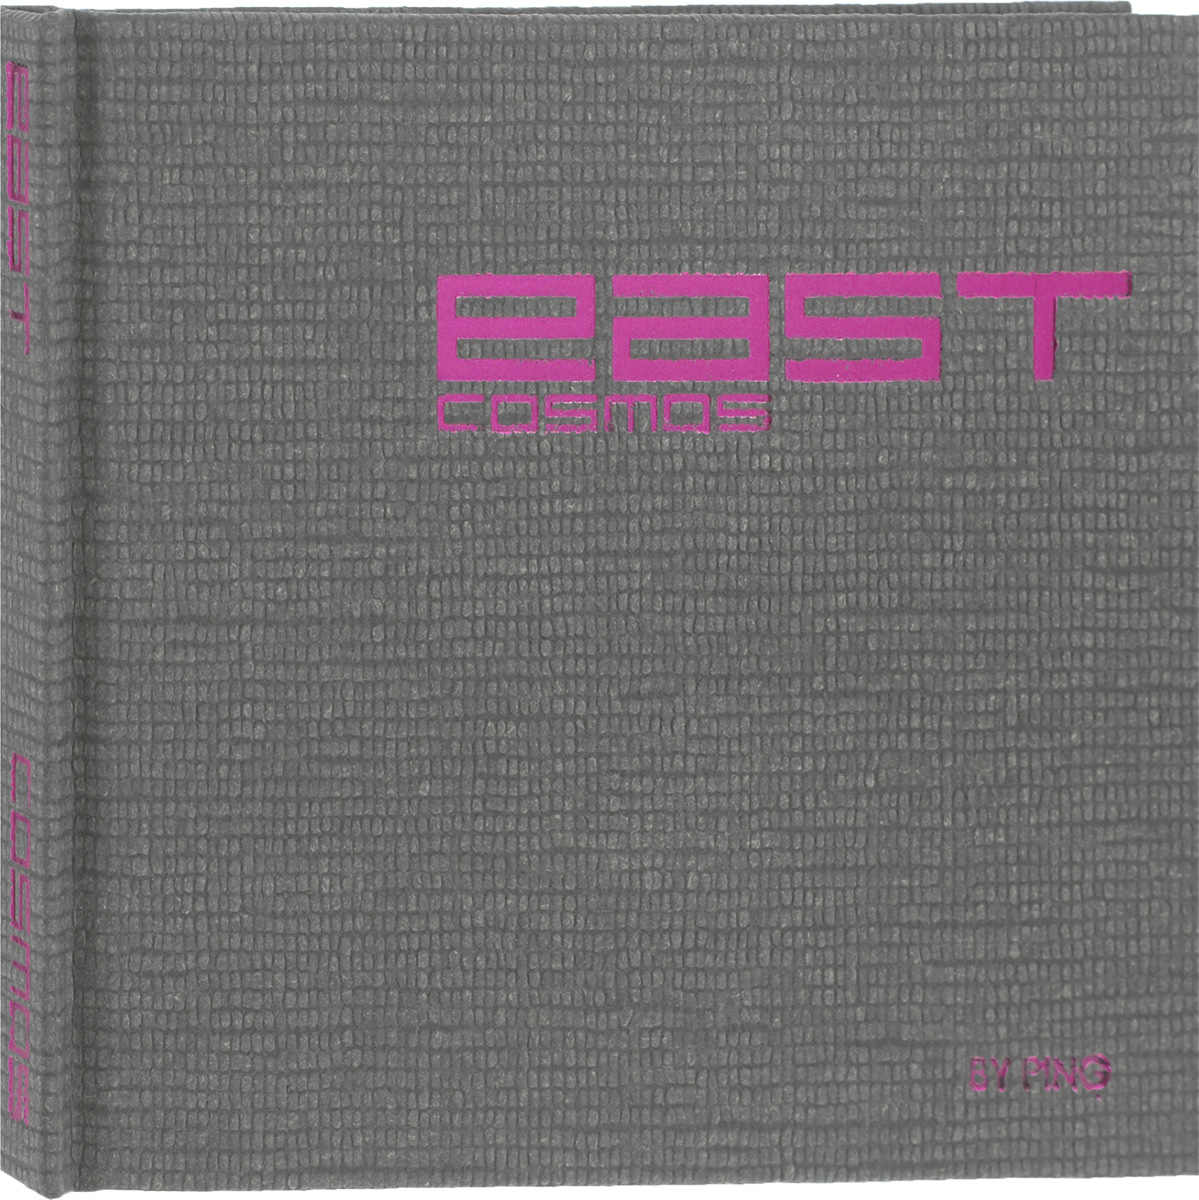 цена на Ping Ping. East Cosmos (2 CD)